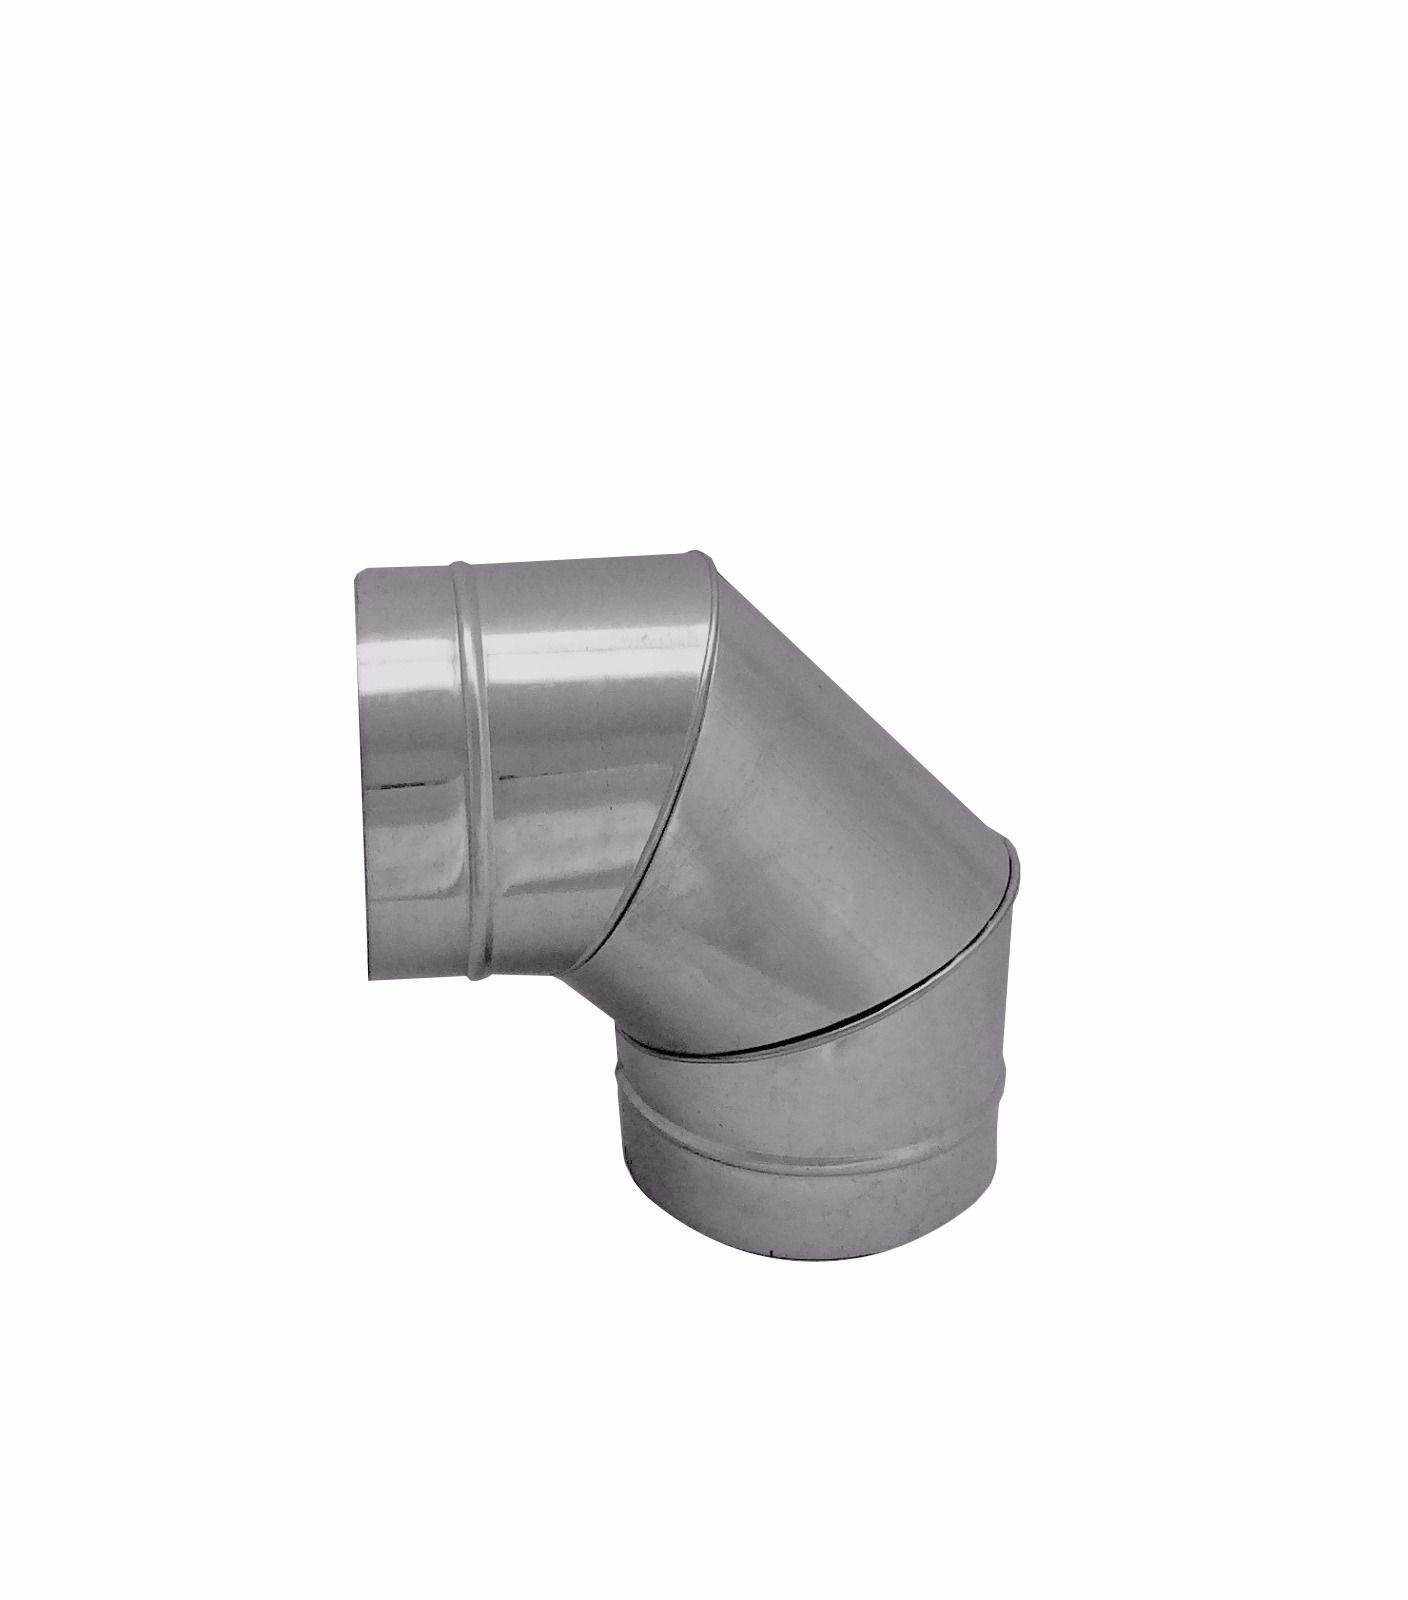 Curva / cotovelo galvanizada 90° de 100 mm de diâmetro  - Galvocalhas